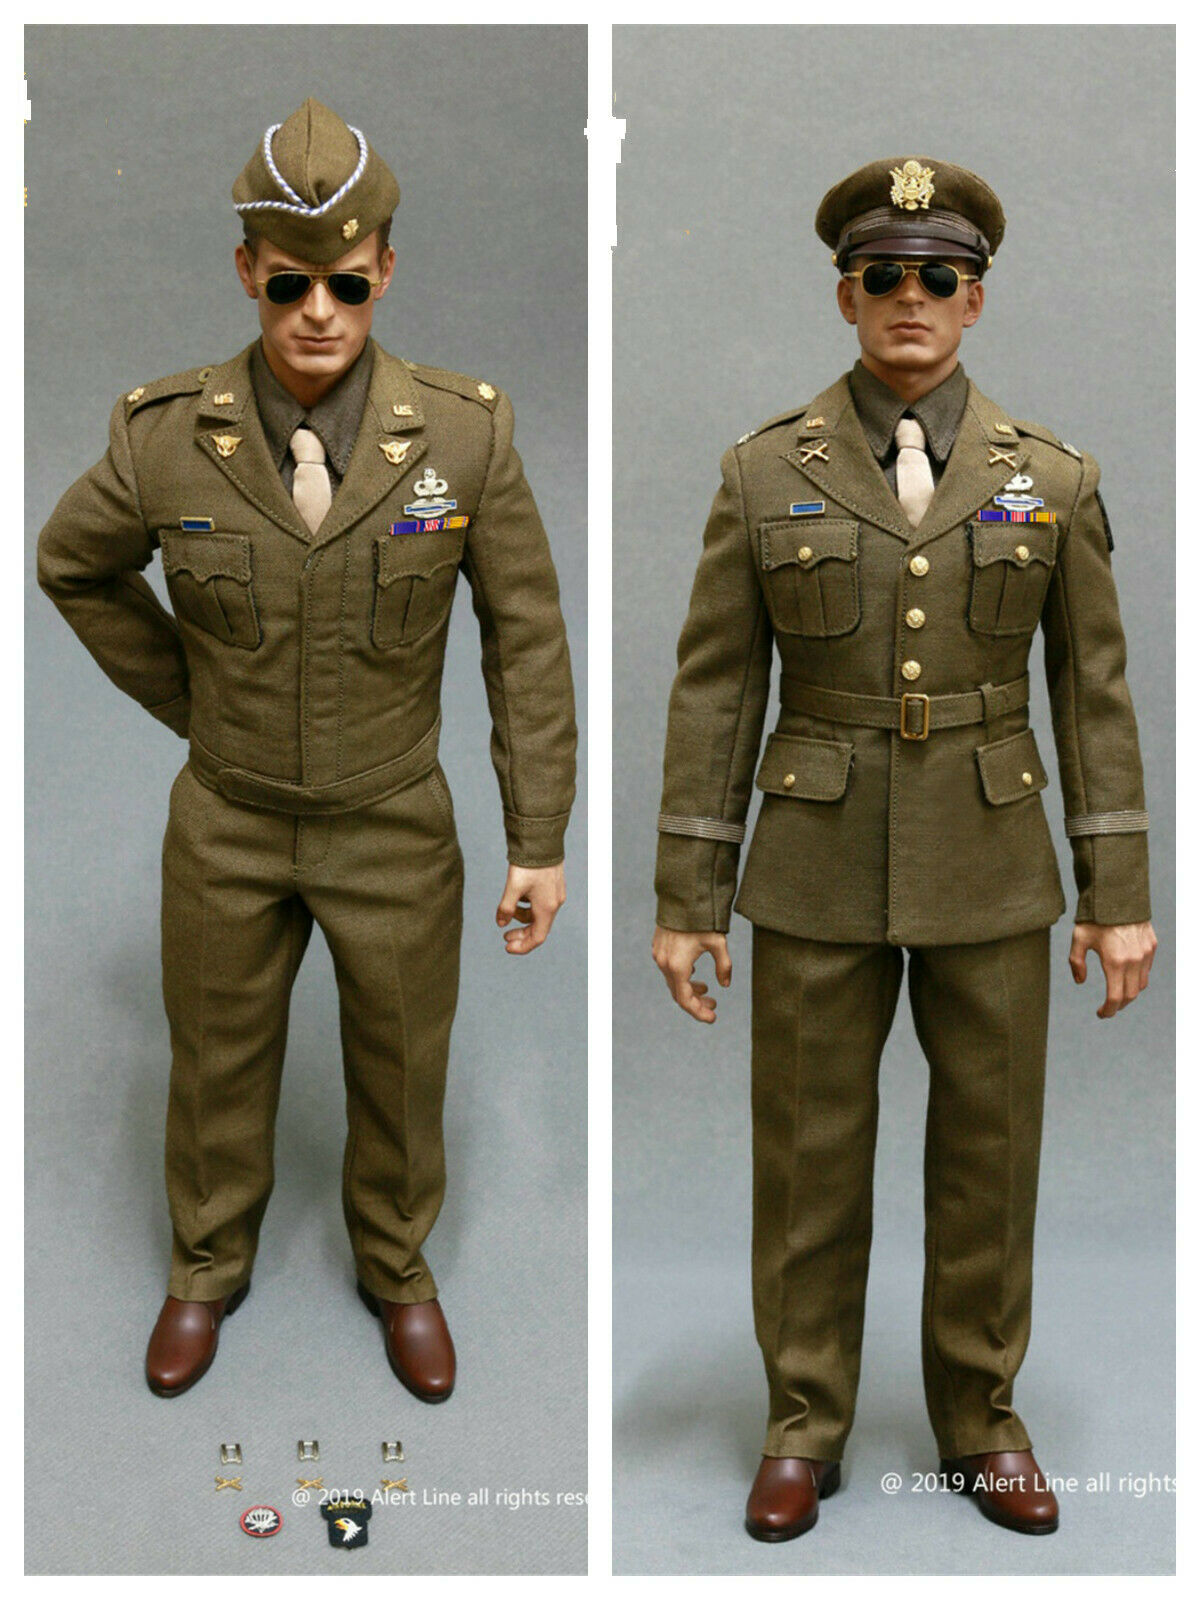 Pre-order 1 6 Alert Line WWII U.S.Army Officer Uniform Suit AL100028